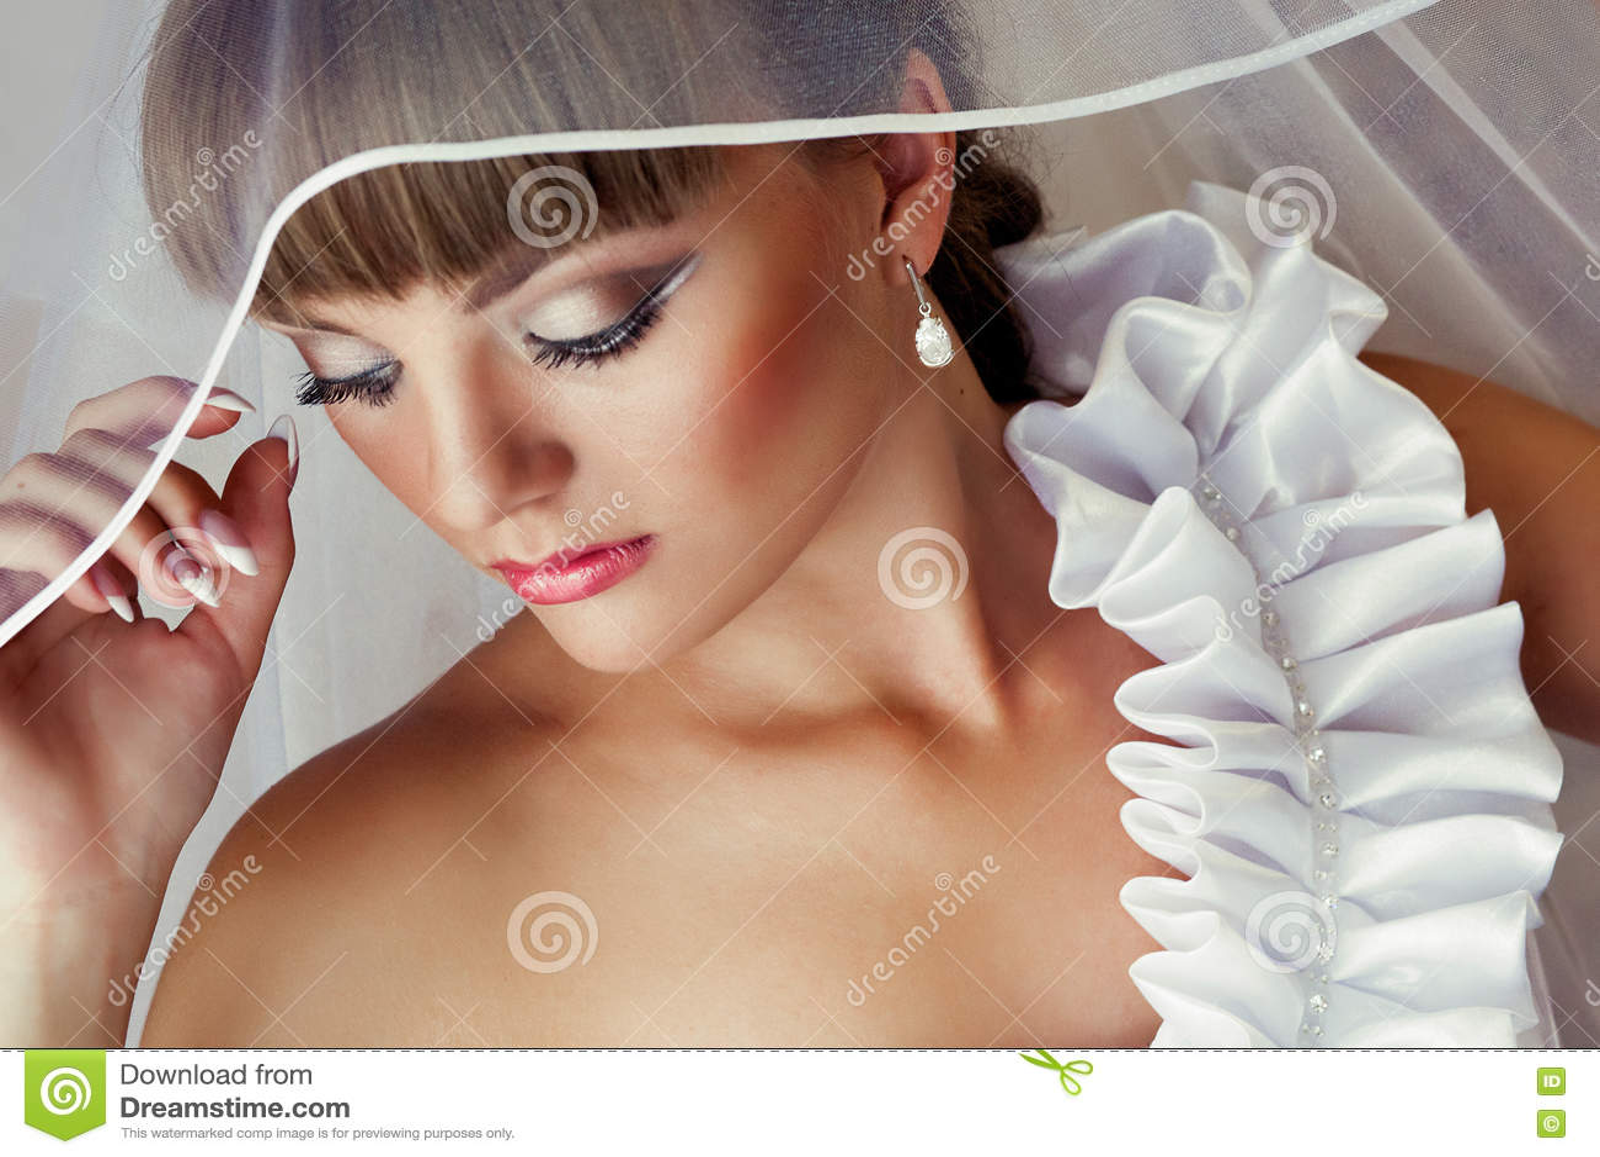 1d66d75e8f9 Όμορφη νύφη με το γάμο Makeup και το γάμο Hairstyle στην Τετάρτη ...